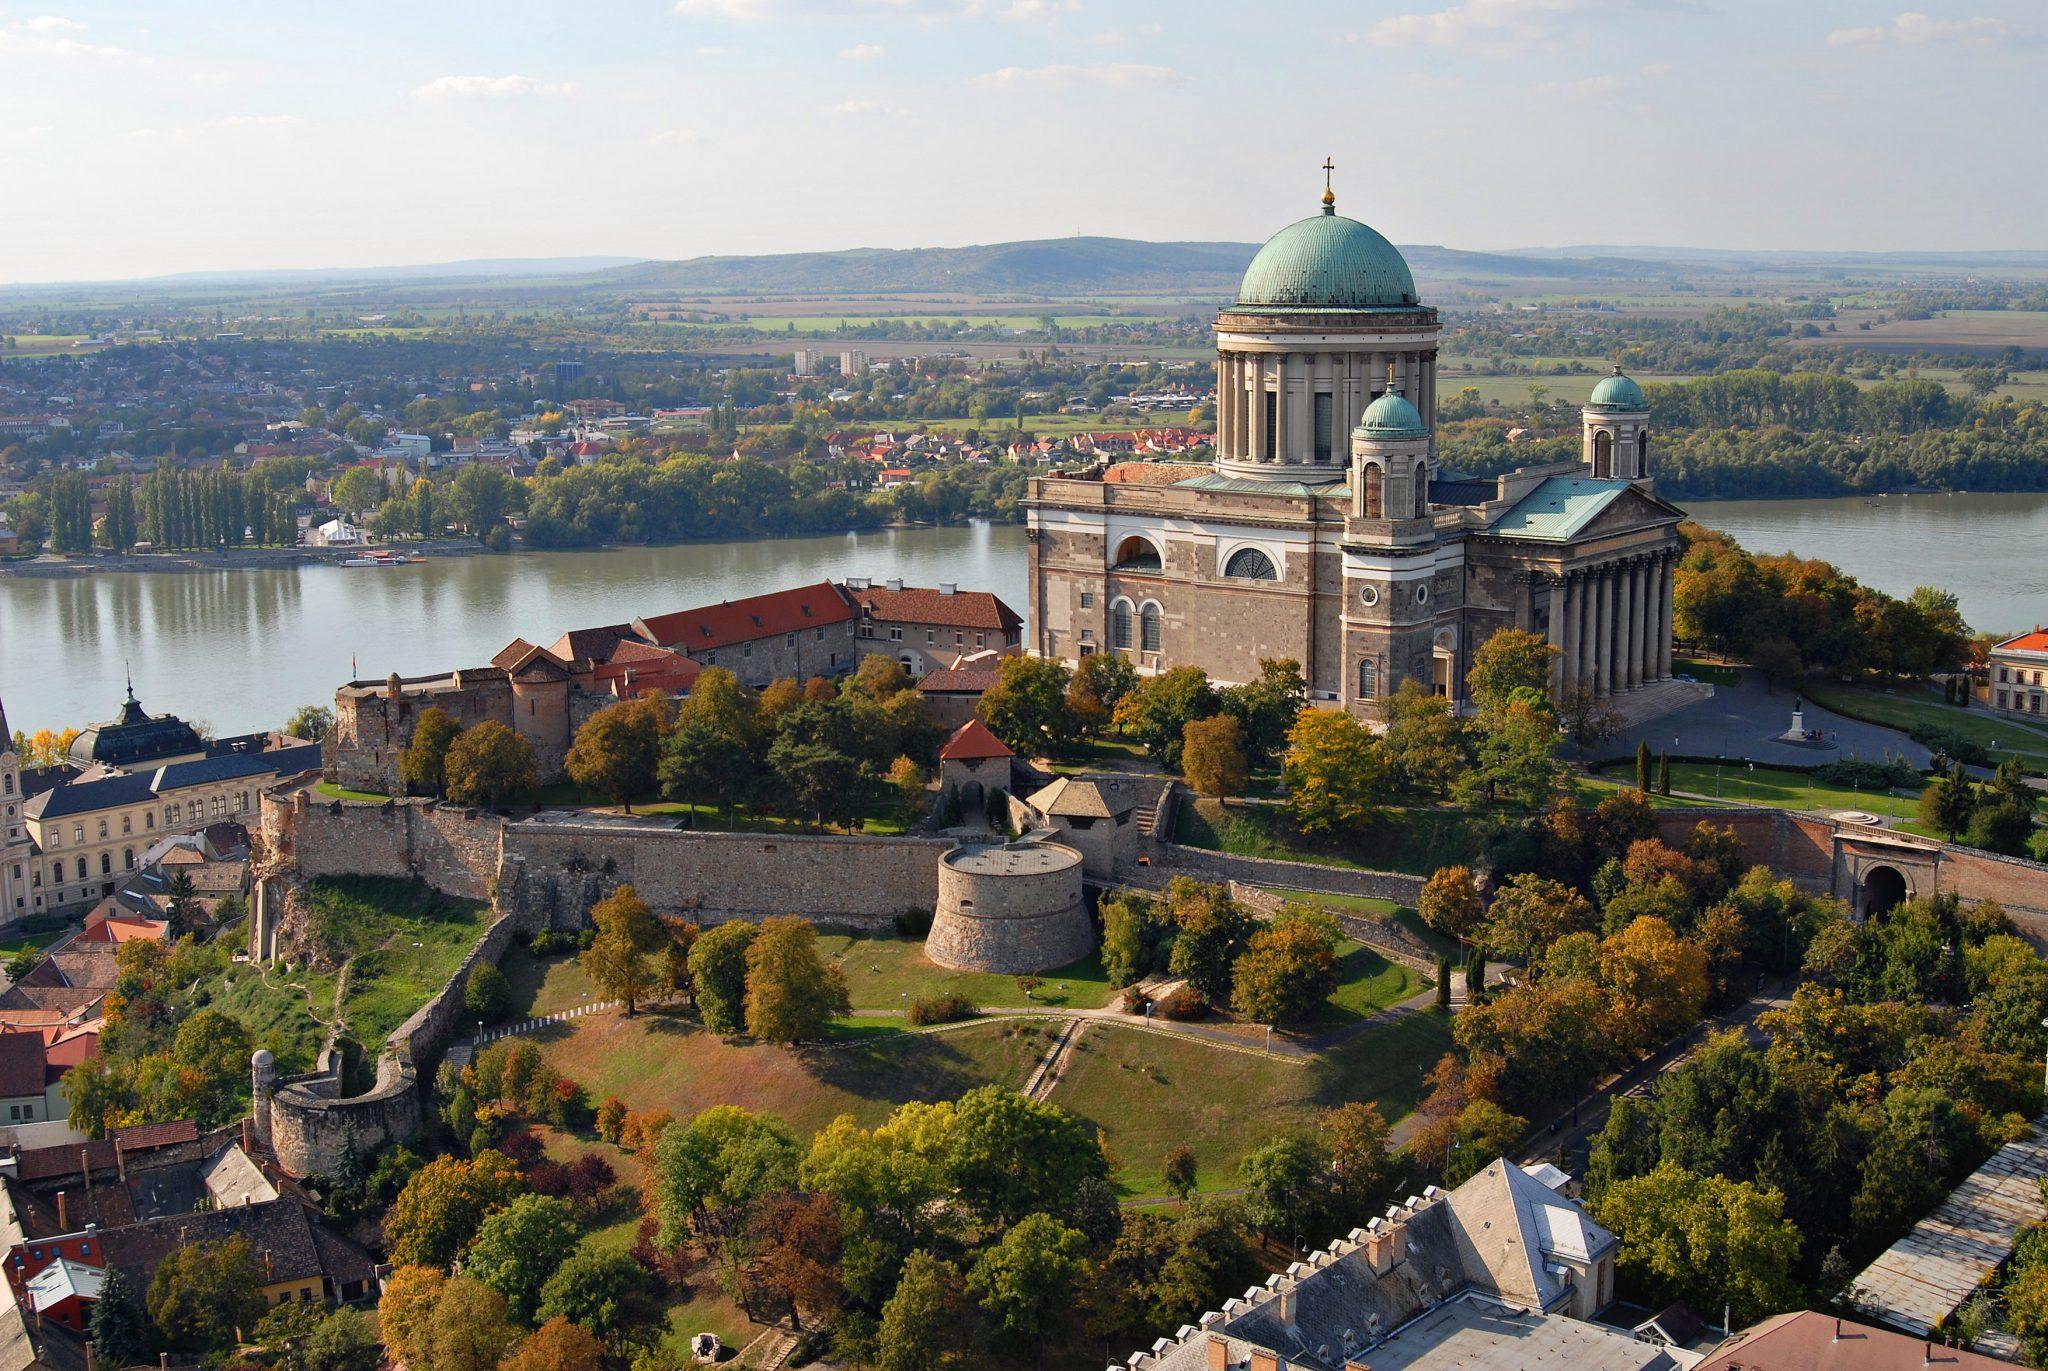 Budapest – Visegrádi vár – Esztergom sétarepülés útvonal ...